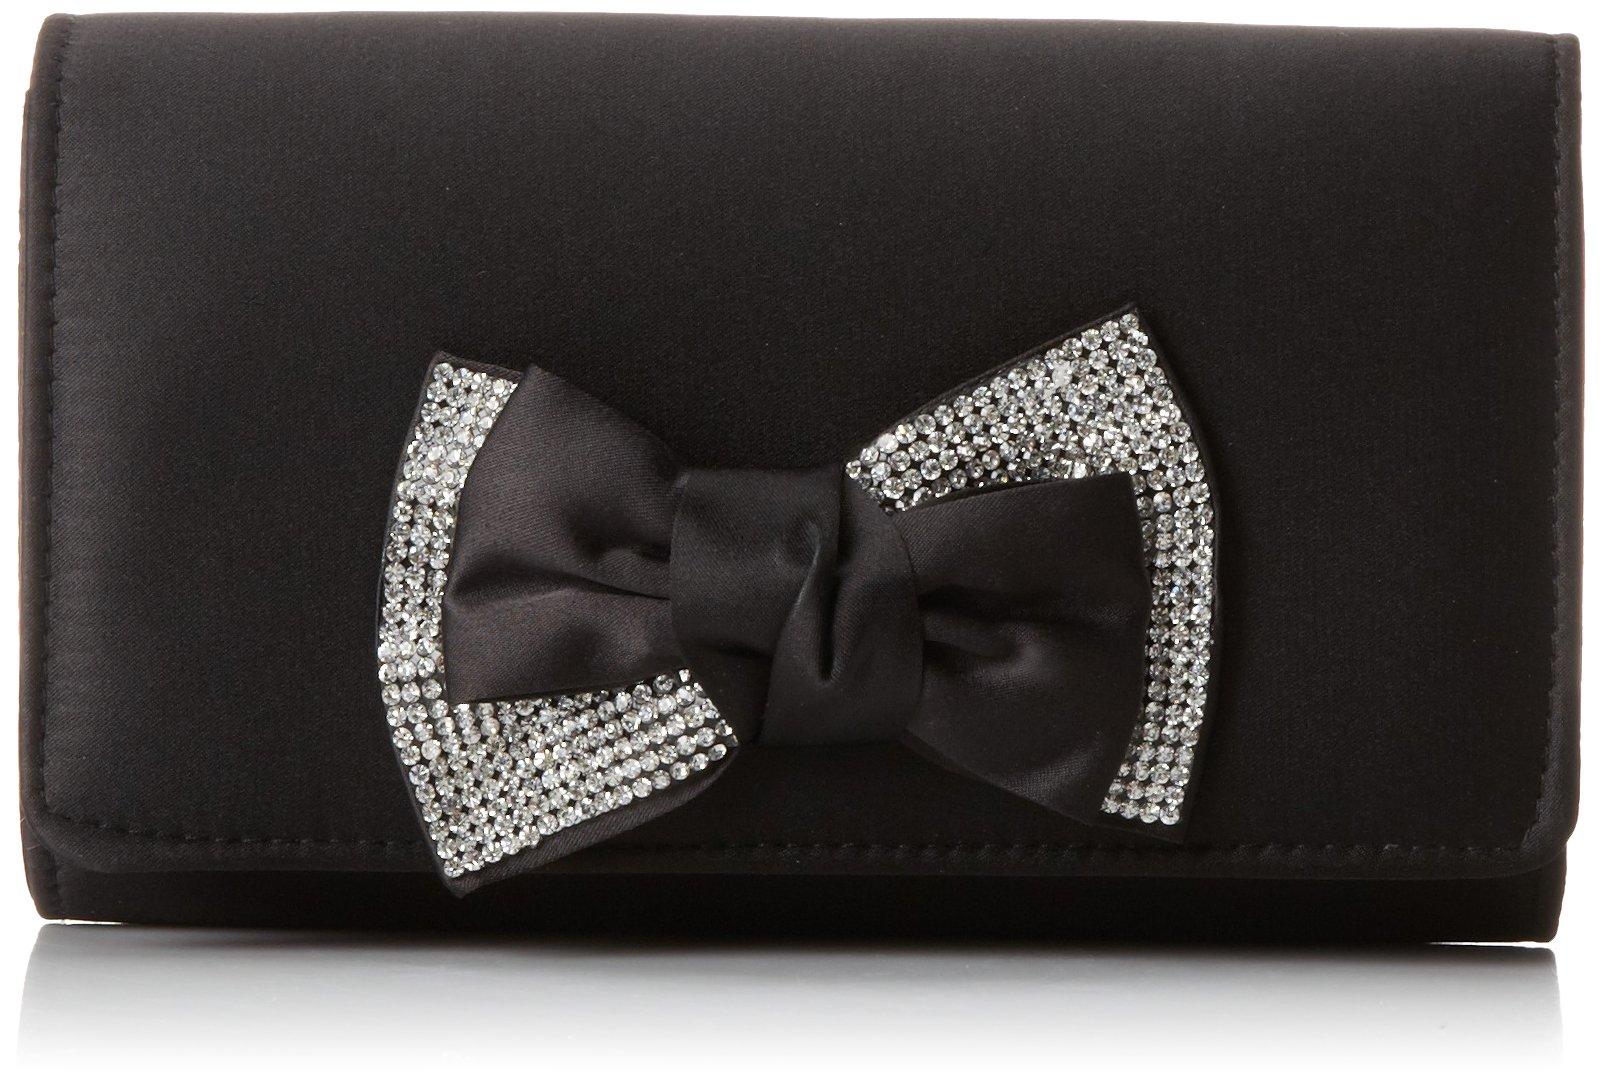 Nina Lafferty-L Clutch, Black, One Size